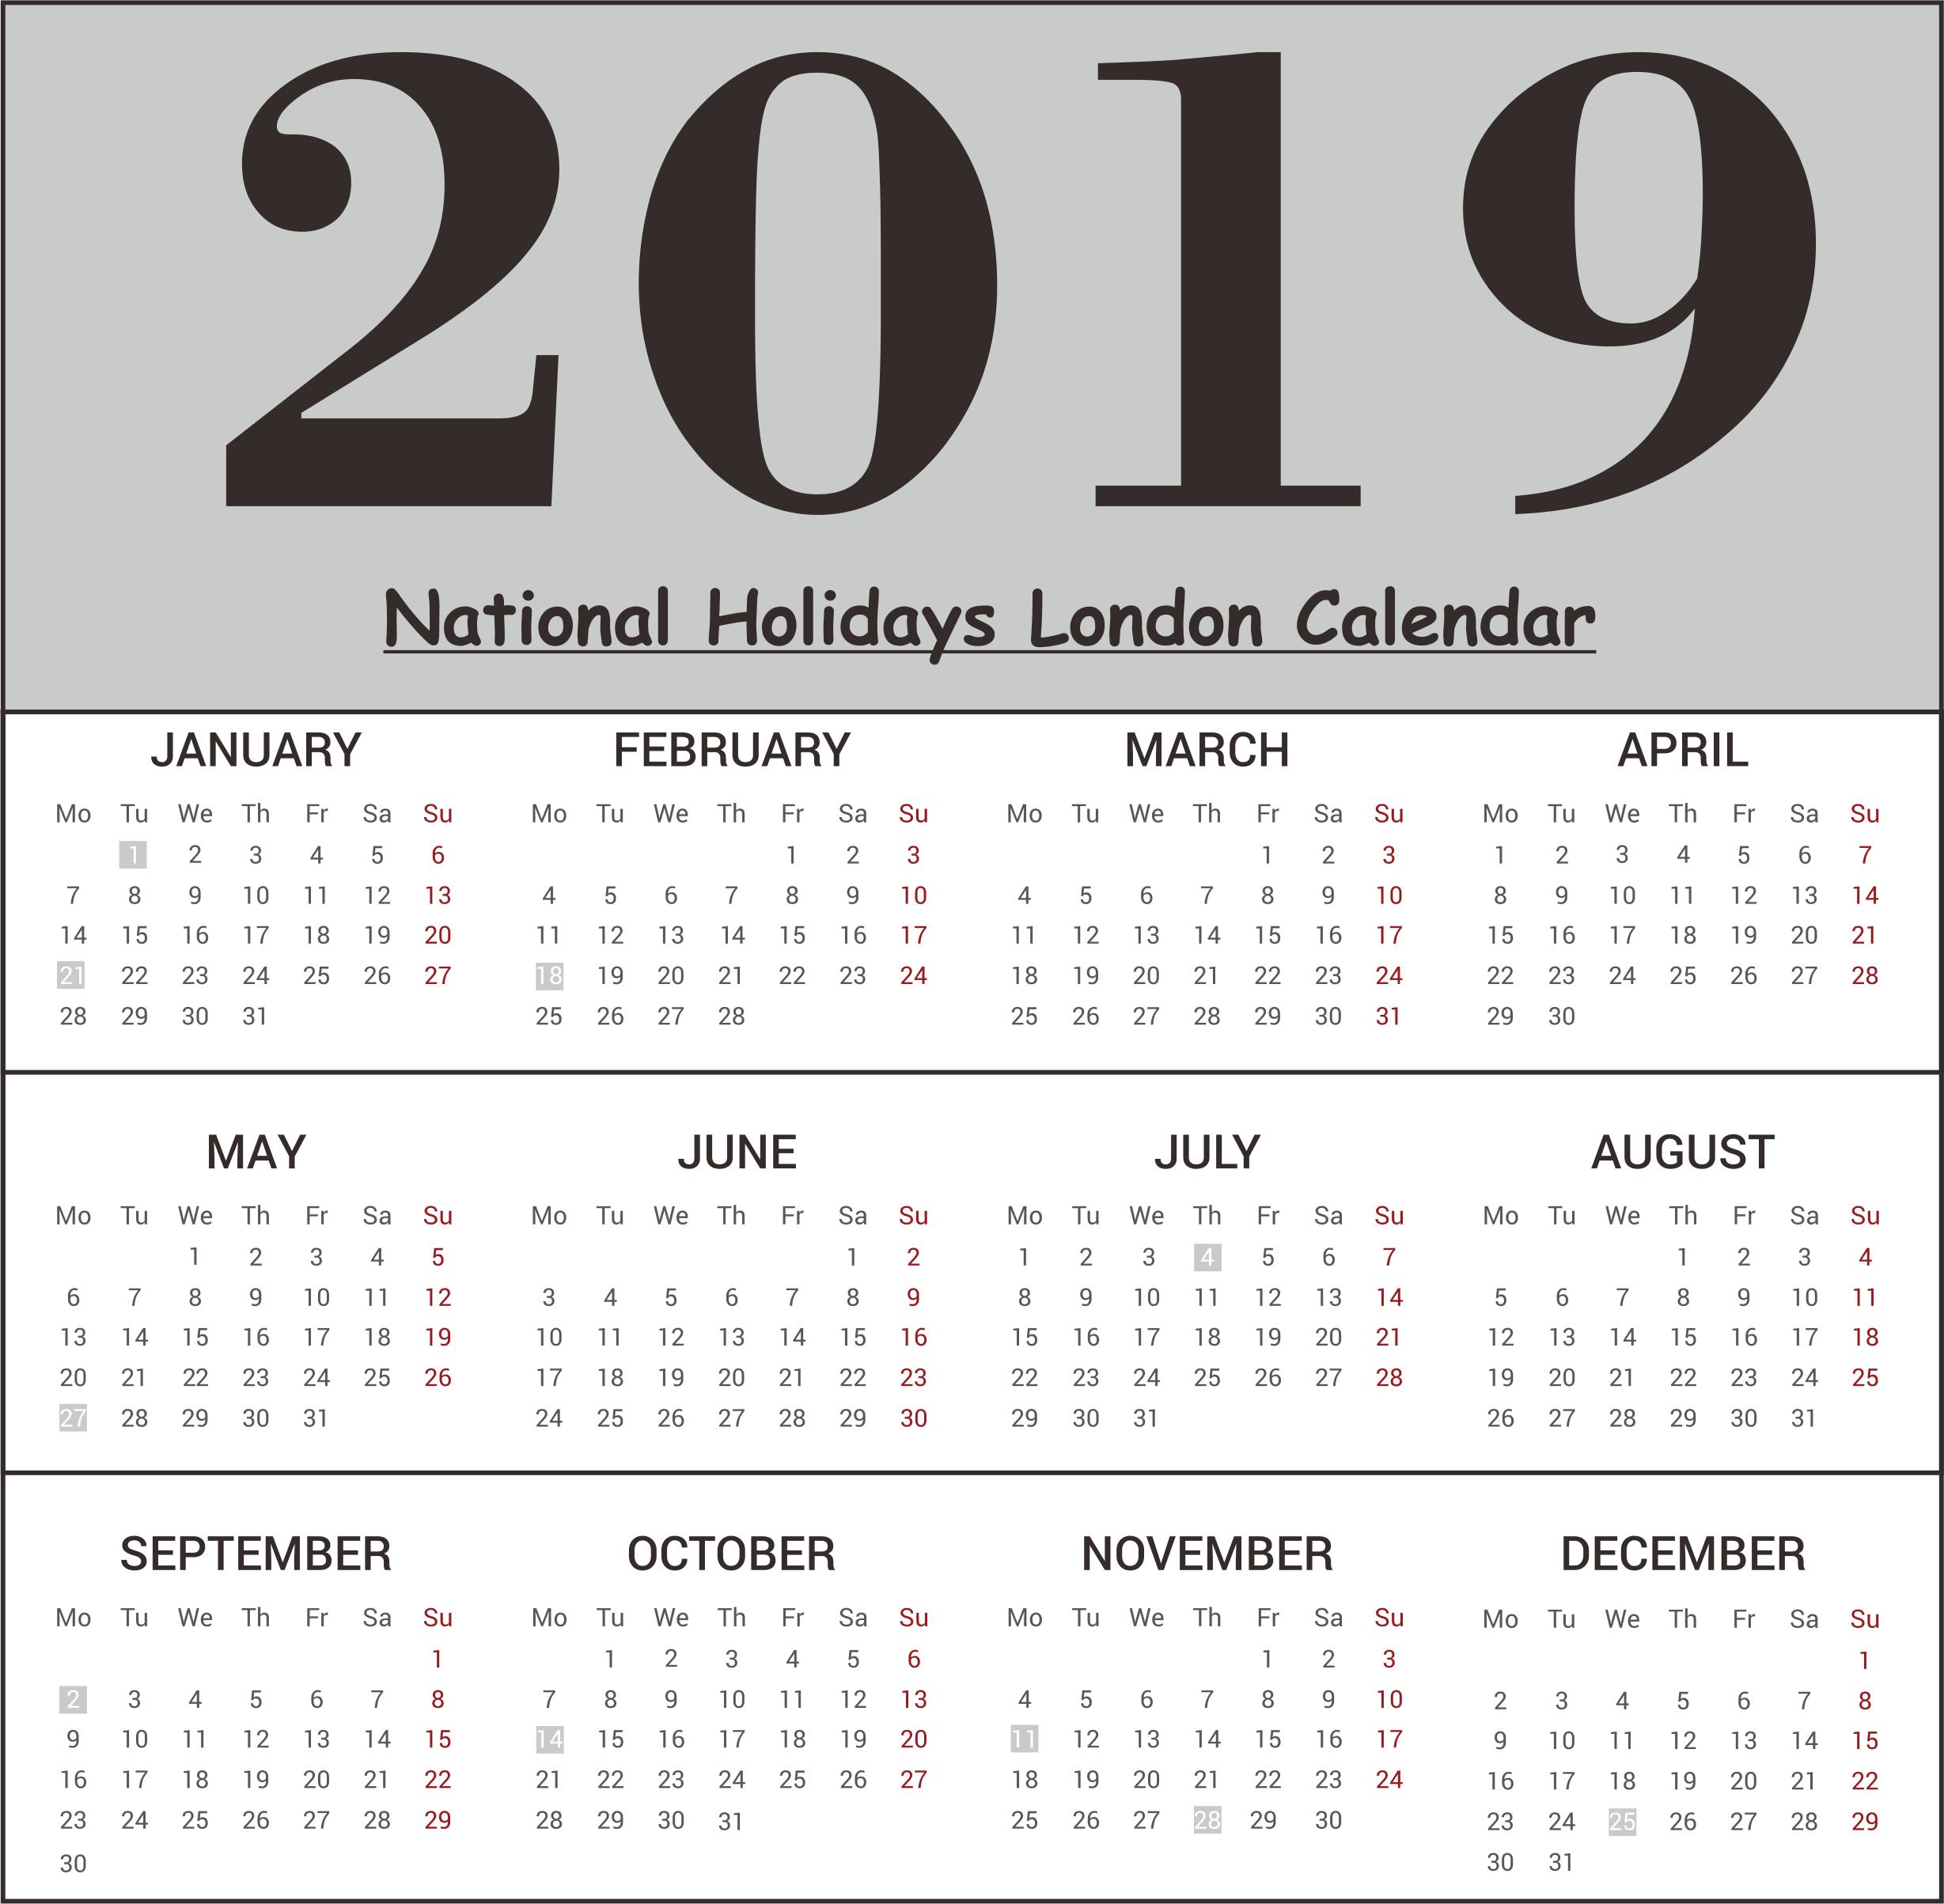 London National Holidays 2019 Calendar